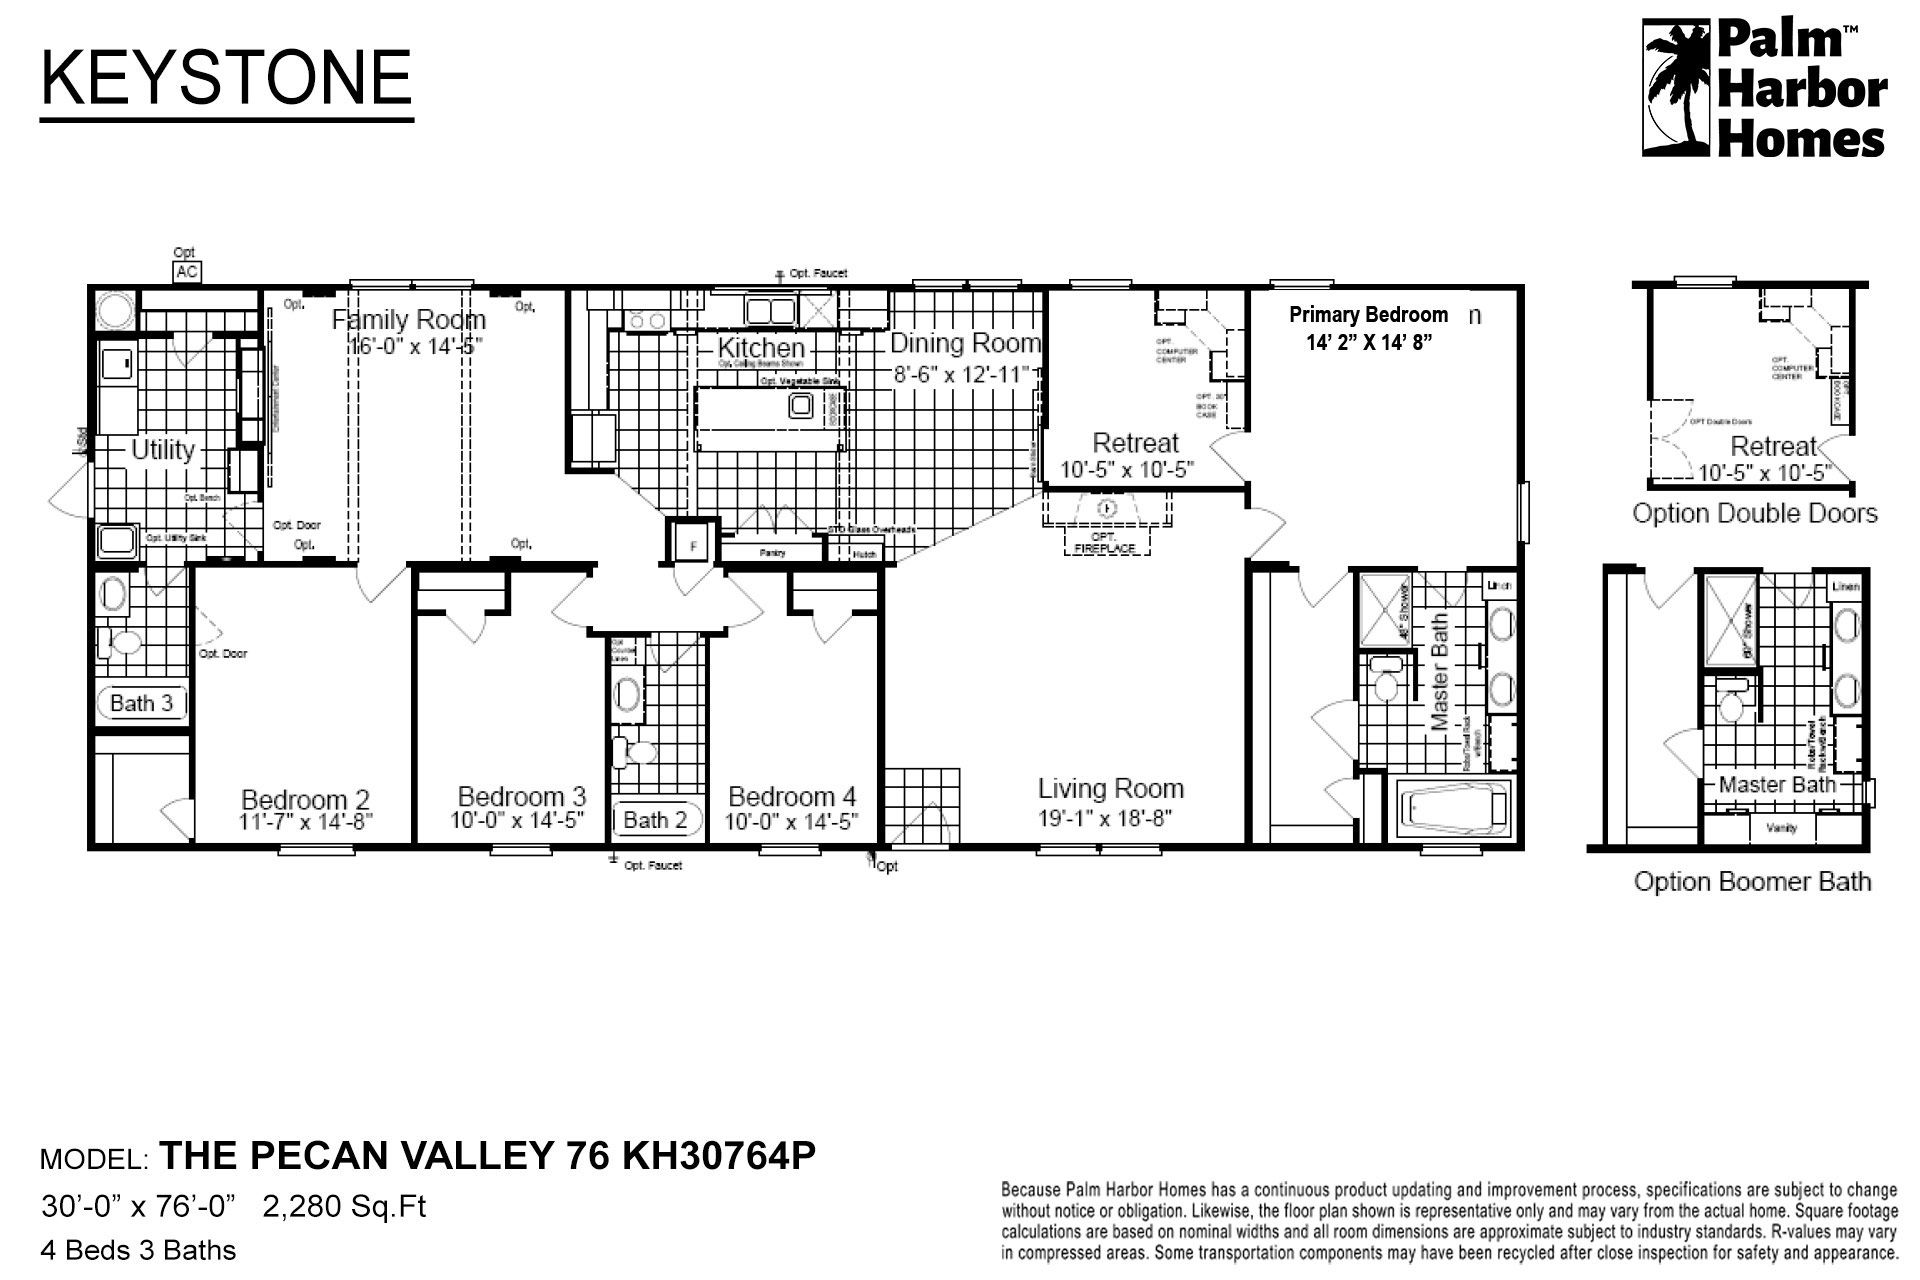 Keystone The Pecan Valley 76 KH30764P Layout